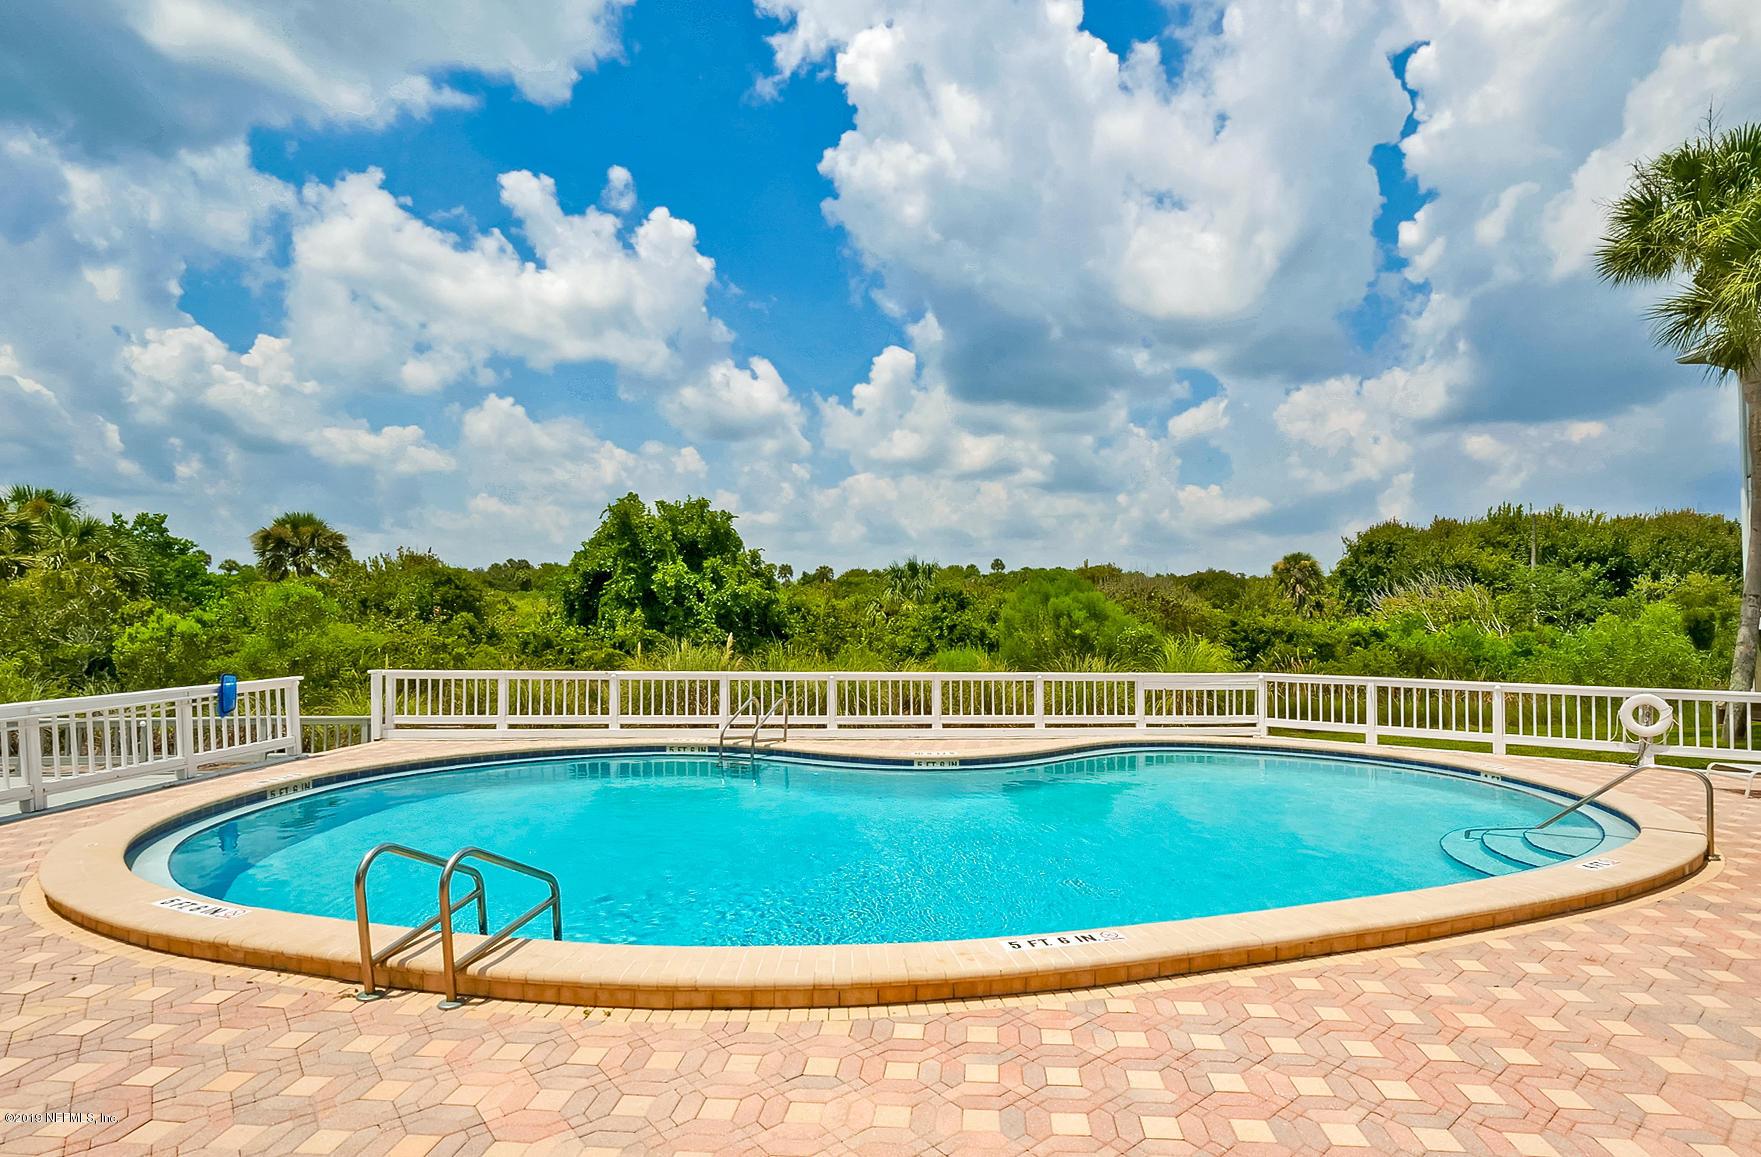 628 PONTE VEDRA, PONTE VEDRA BEACH, FLORIDA 32082, 3 Bedrooms Bedrooms, ,2 BathroomsBathrooms,Condo,For sale,PONTE VEDRA,1010322